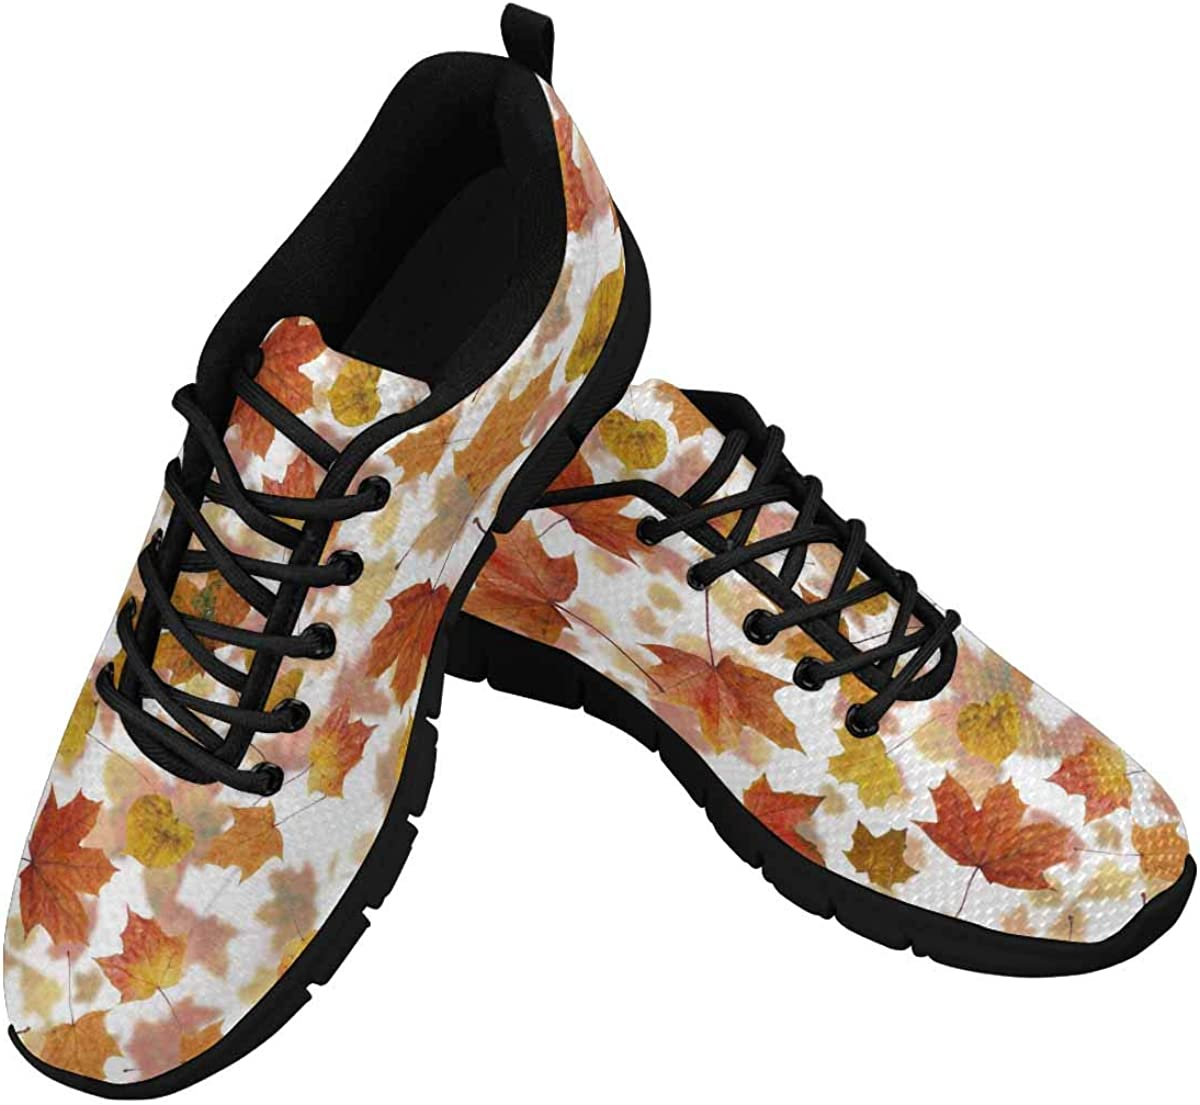 INTERESTPRINT Watercolor Autumn Leaves Women's Breathable Non Slip Sneakers